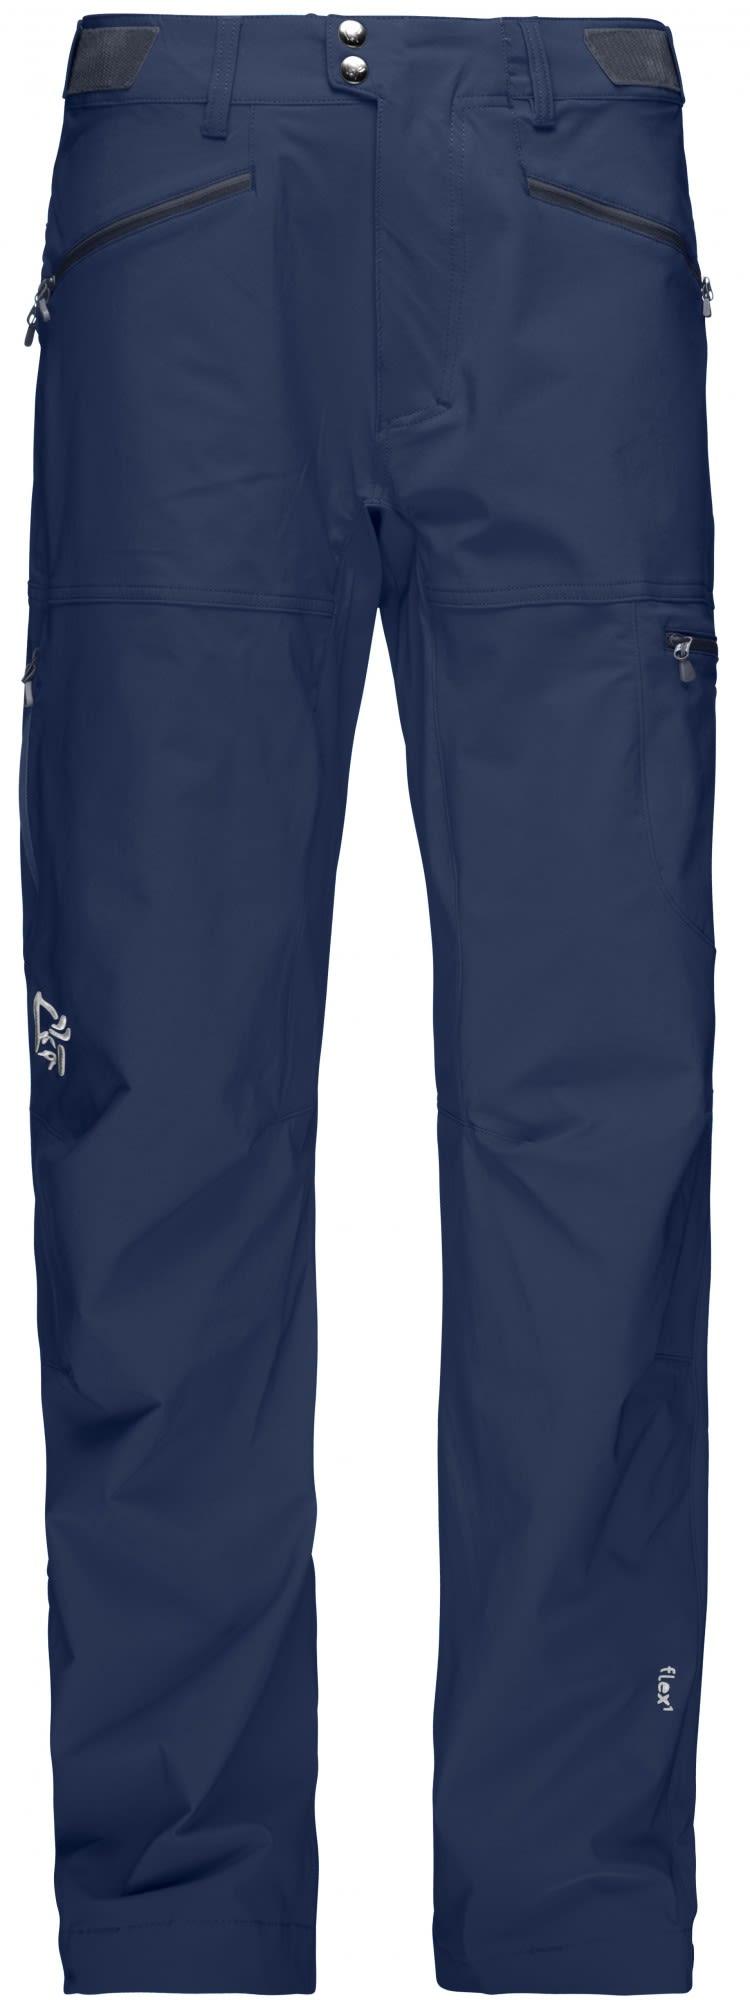 Norrona M Falketind Flex1 Pants | Größe XS,S,M,L,XL,XXL | Herren Hose